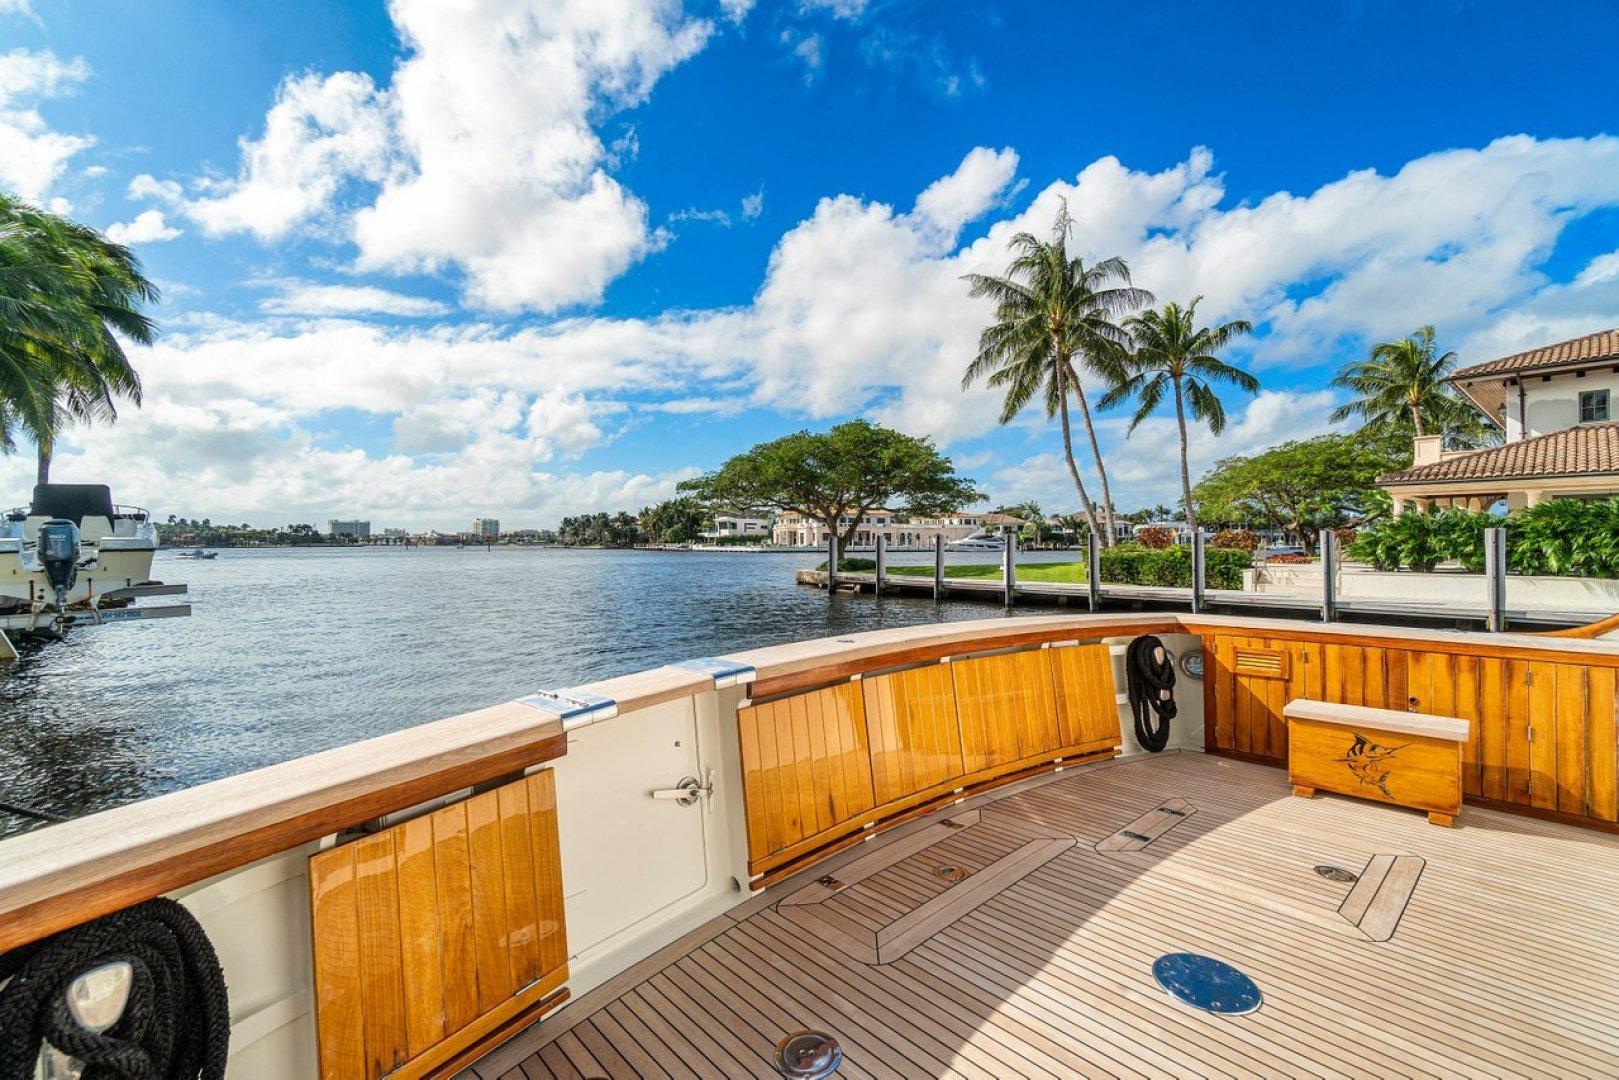 Feadship-Yacht Fisherman 1977-Impetuous Fort Lauderdale-Florida-United States-1575510 | Thumbnail